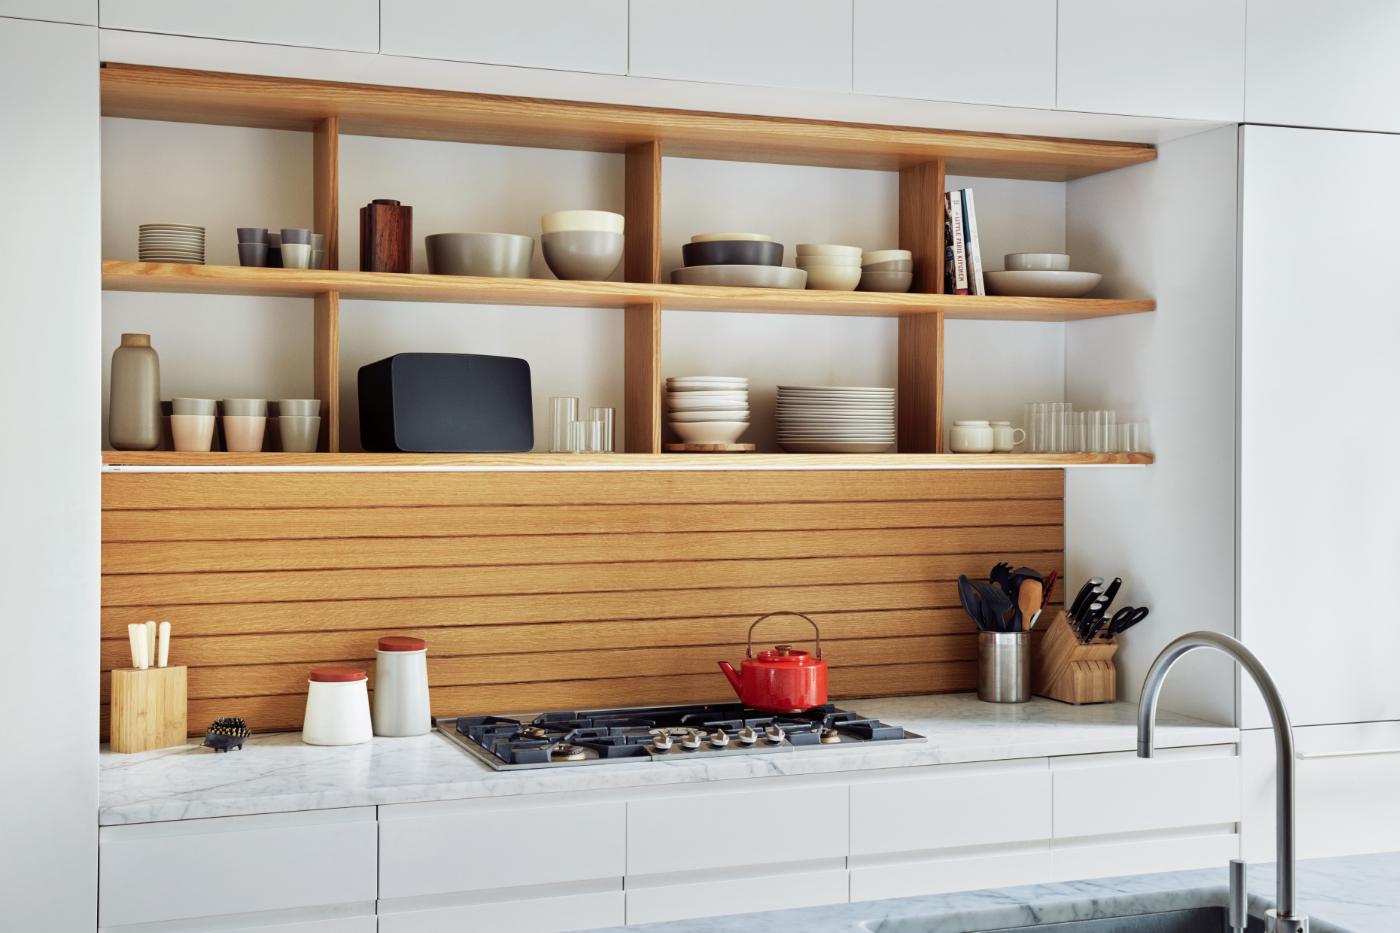 Five_Black-Lifestyle-Kitchen-Q3FY20_MST-MST_JPEG_fid87512